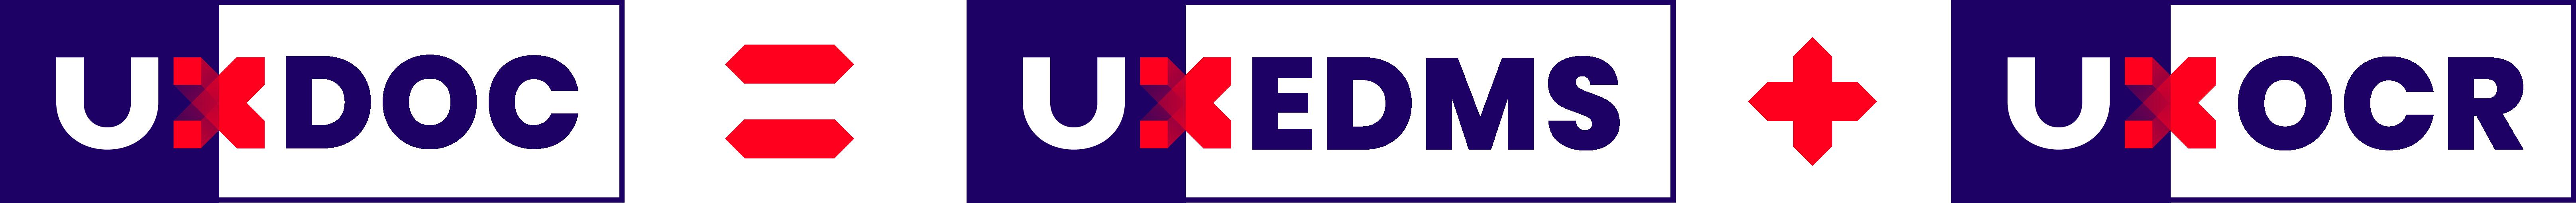 UX DOC = UXEDMS + UXOCR